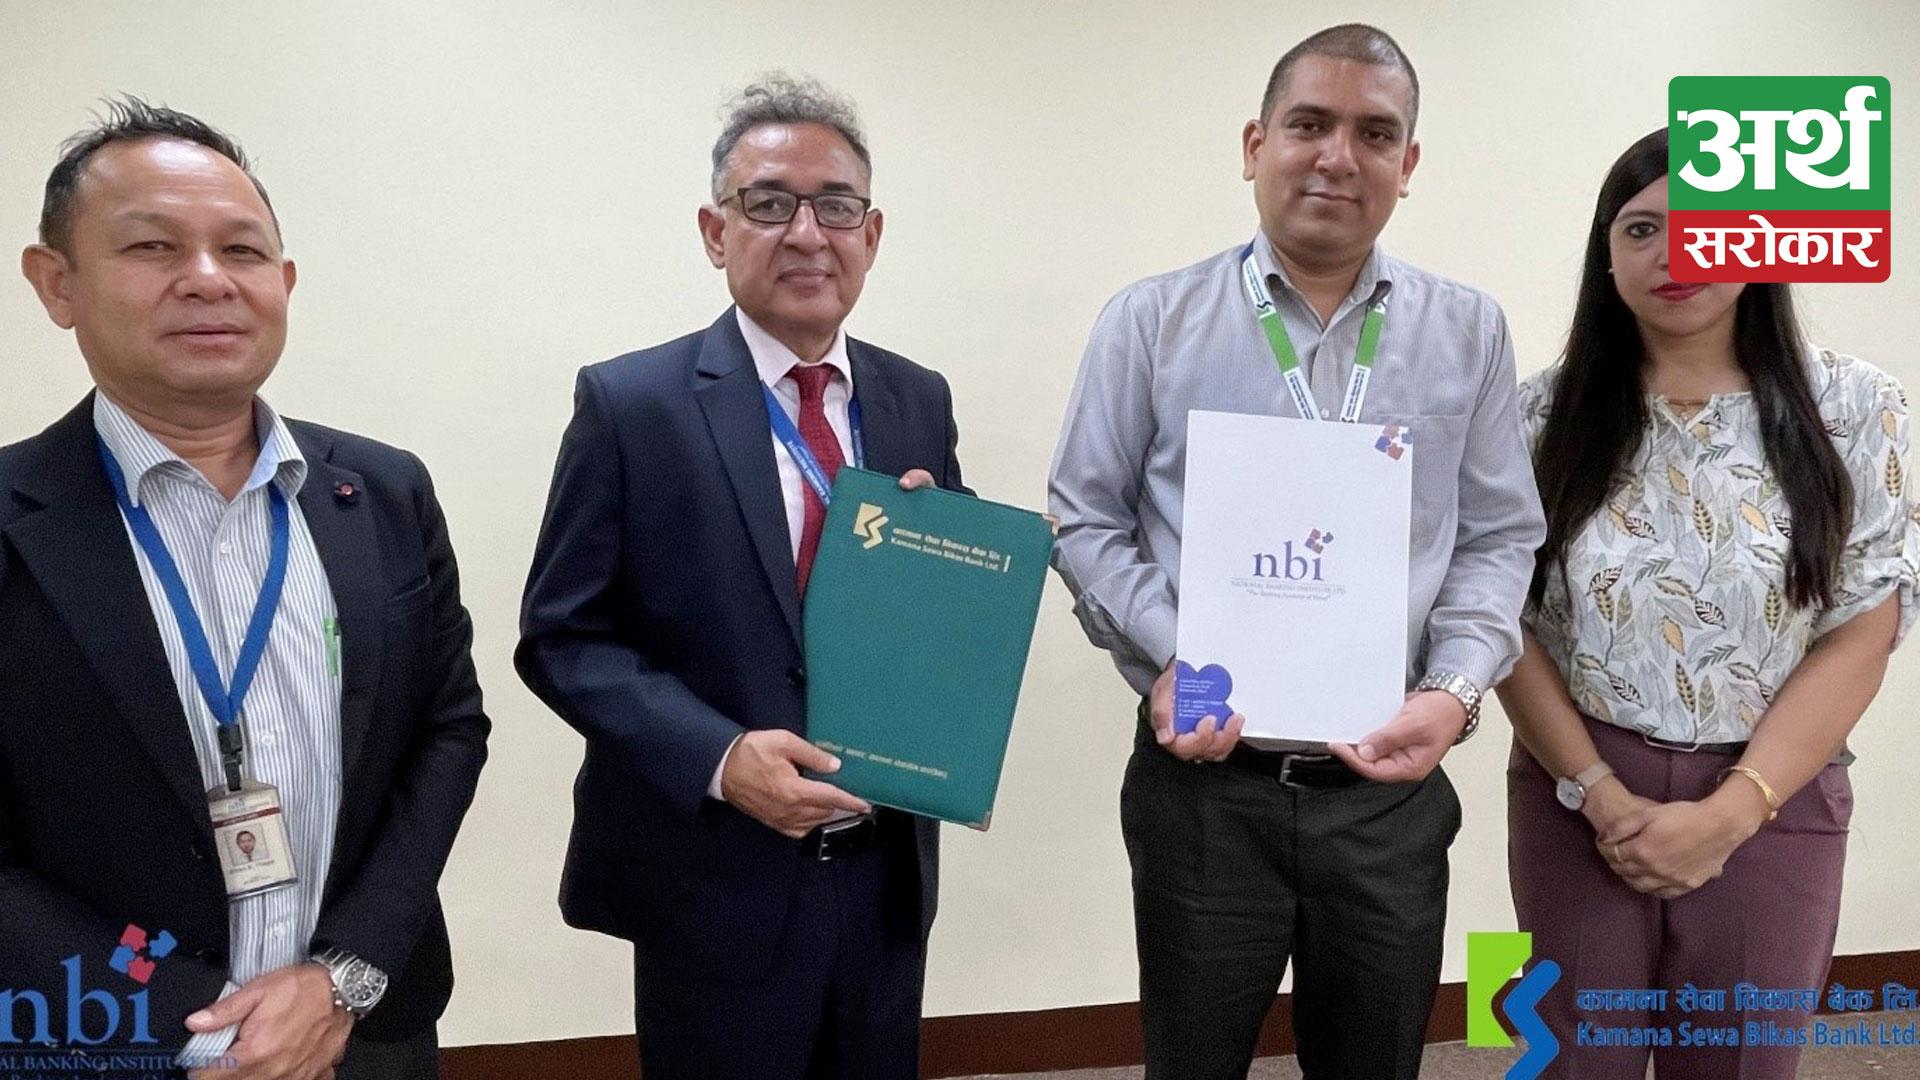 MOU Signed between National Banking Institute and Kamana Sewa Bikas Bank